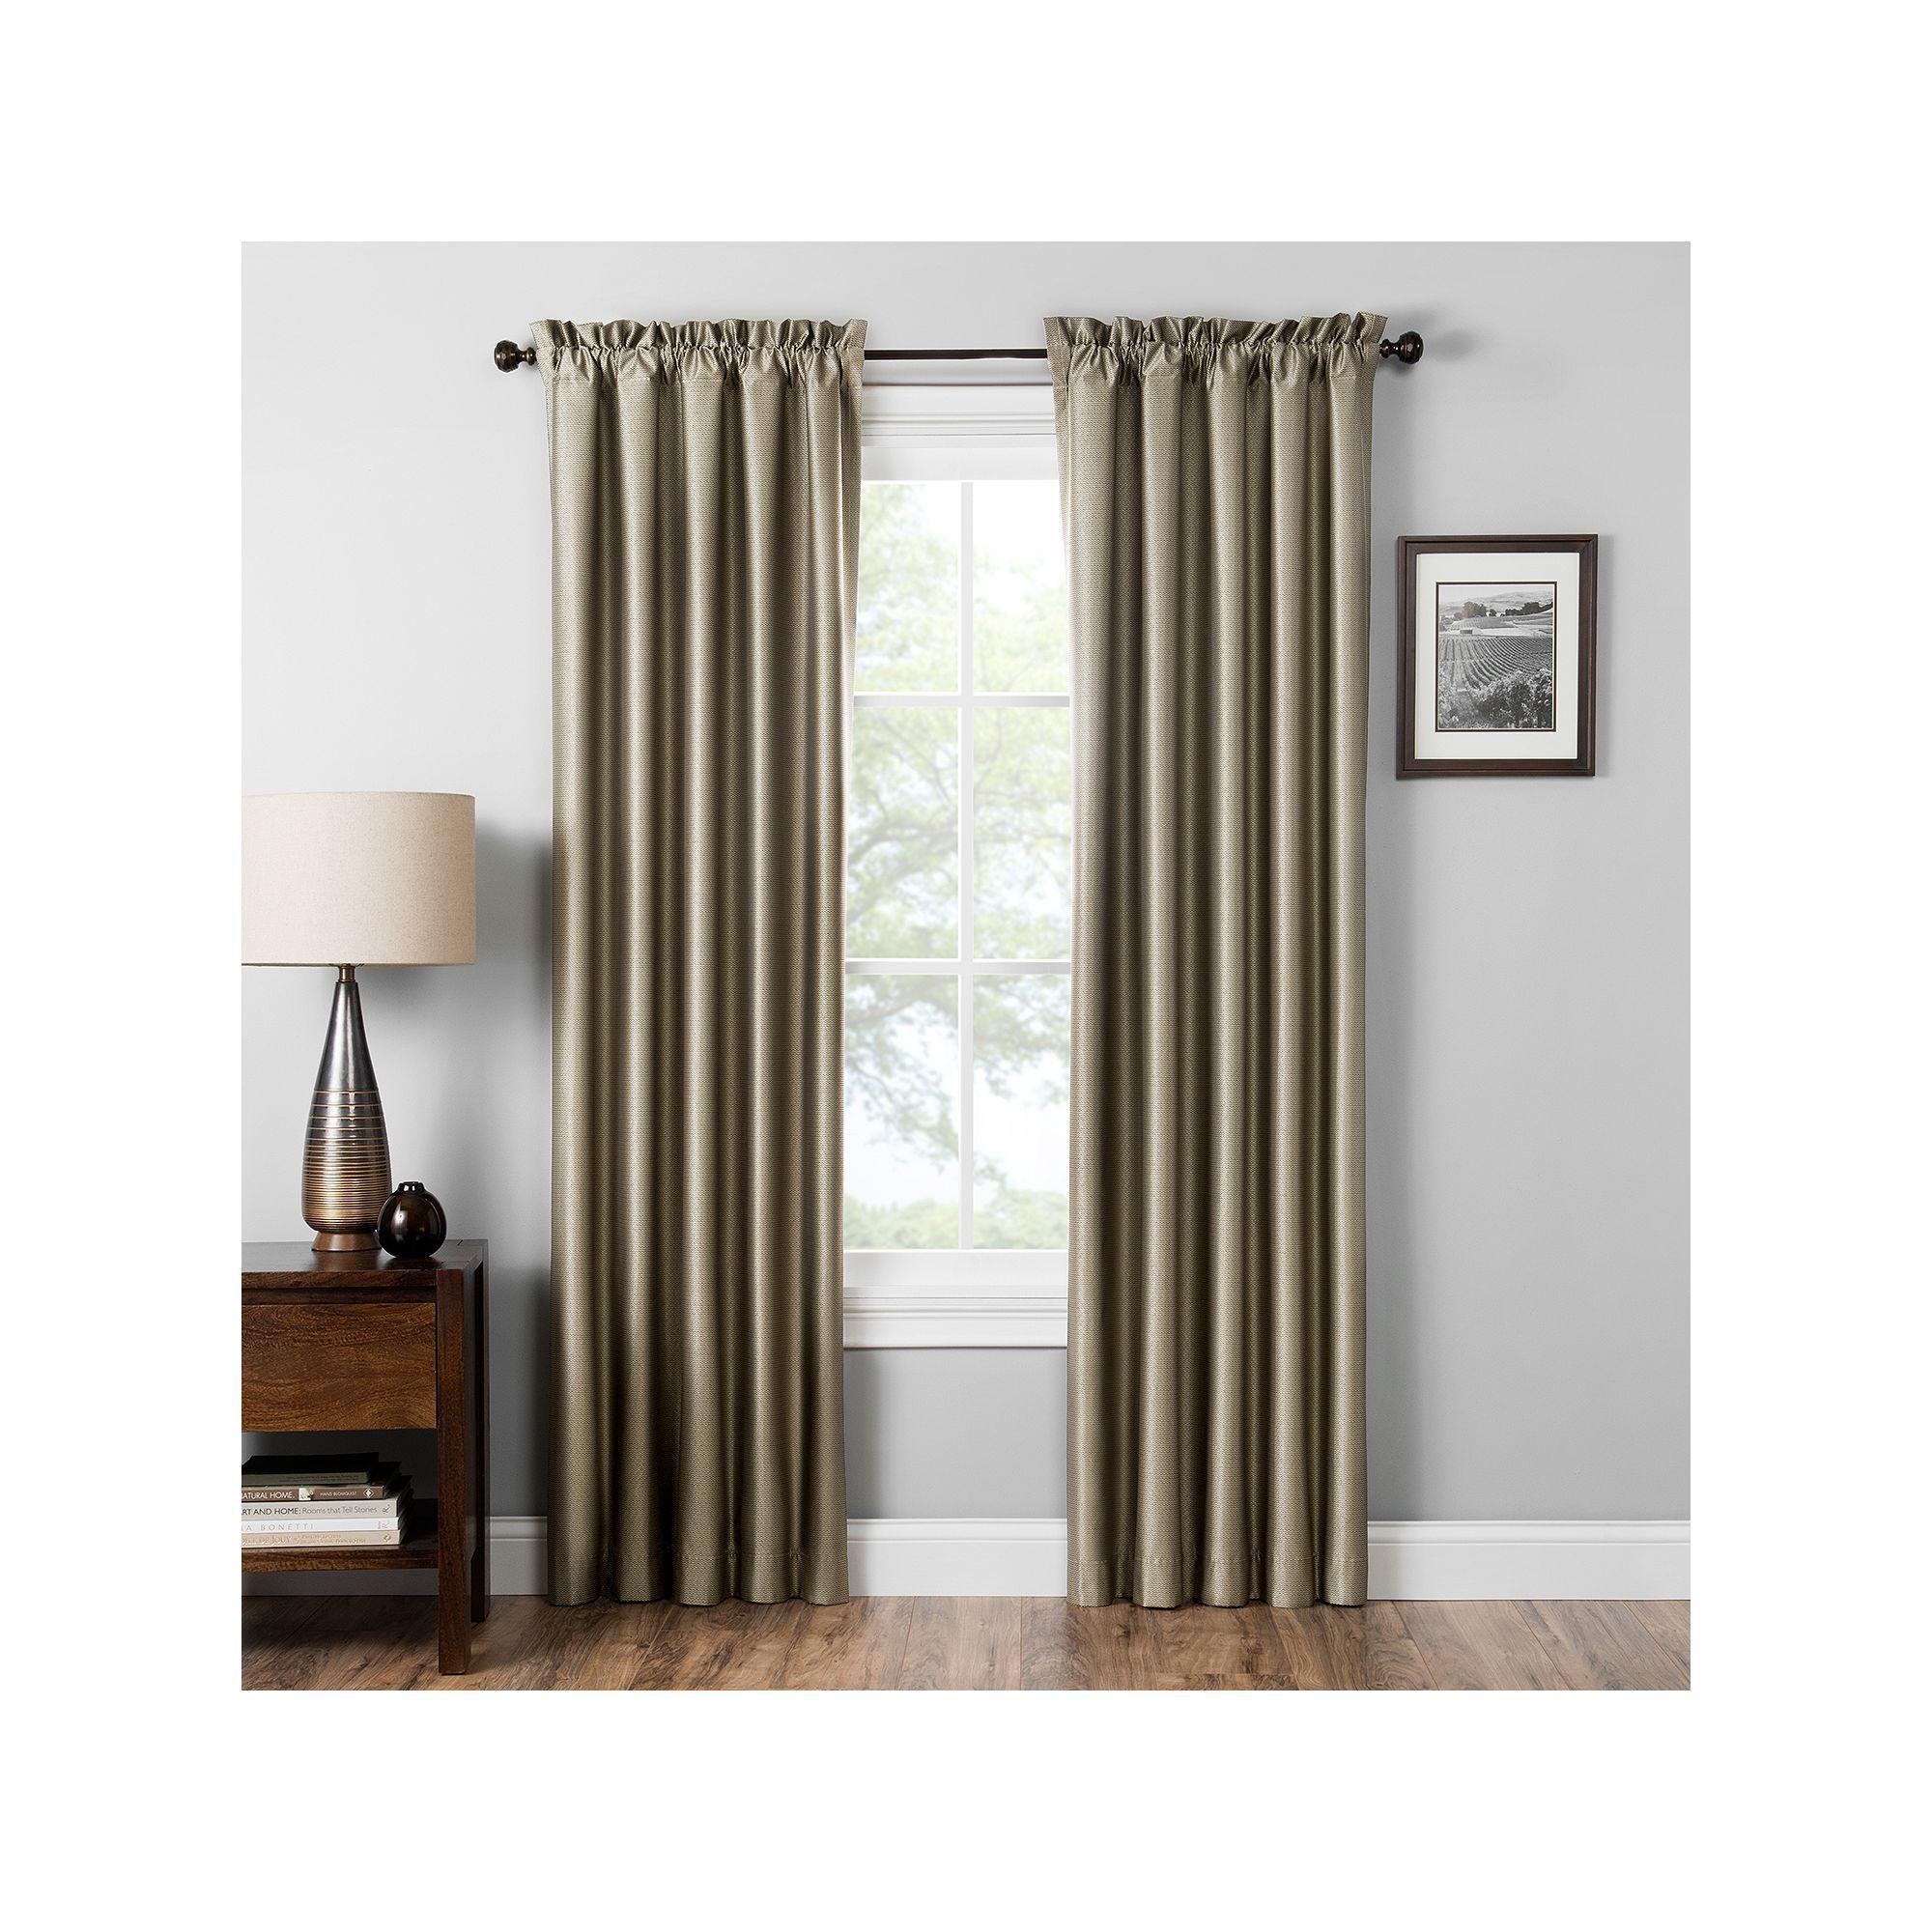 Eclipse Miles Blackout Window Curtain, Brown, 42x84 With Thermaback Blackout Window Curtains (View 24 of 30)